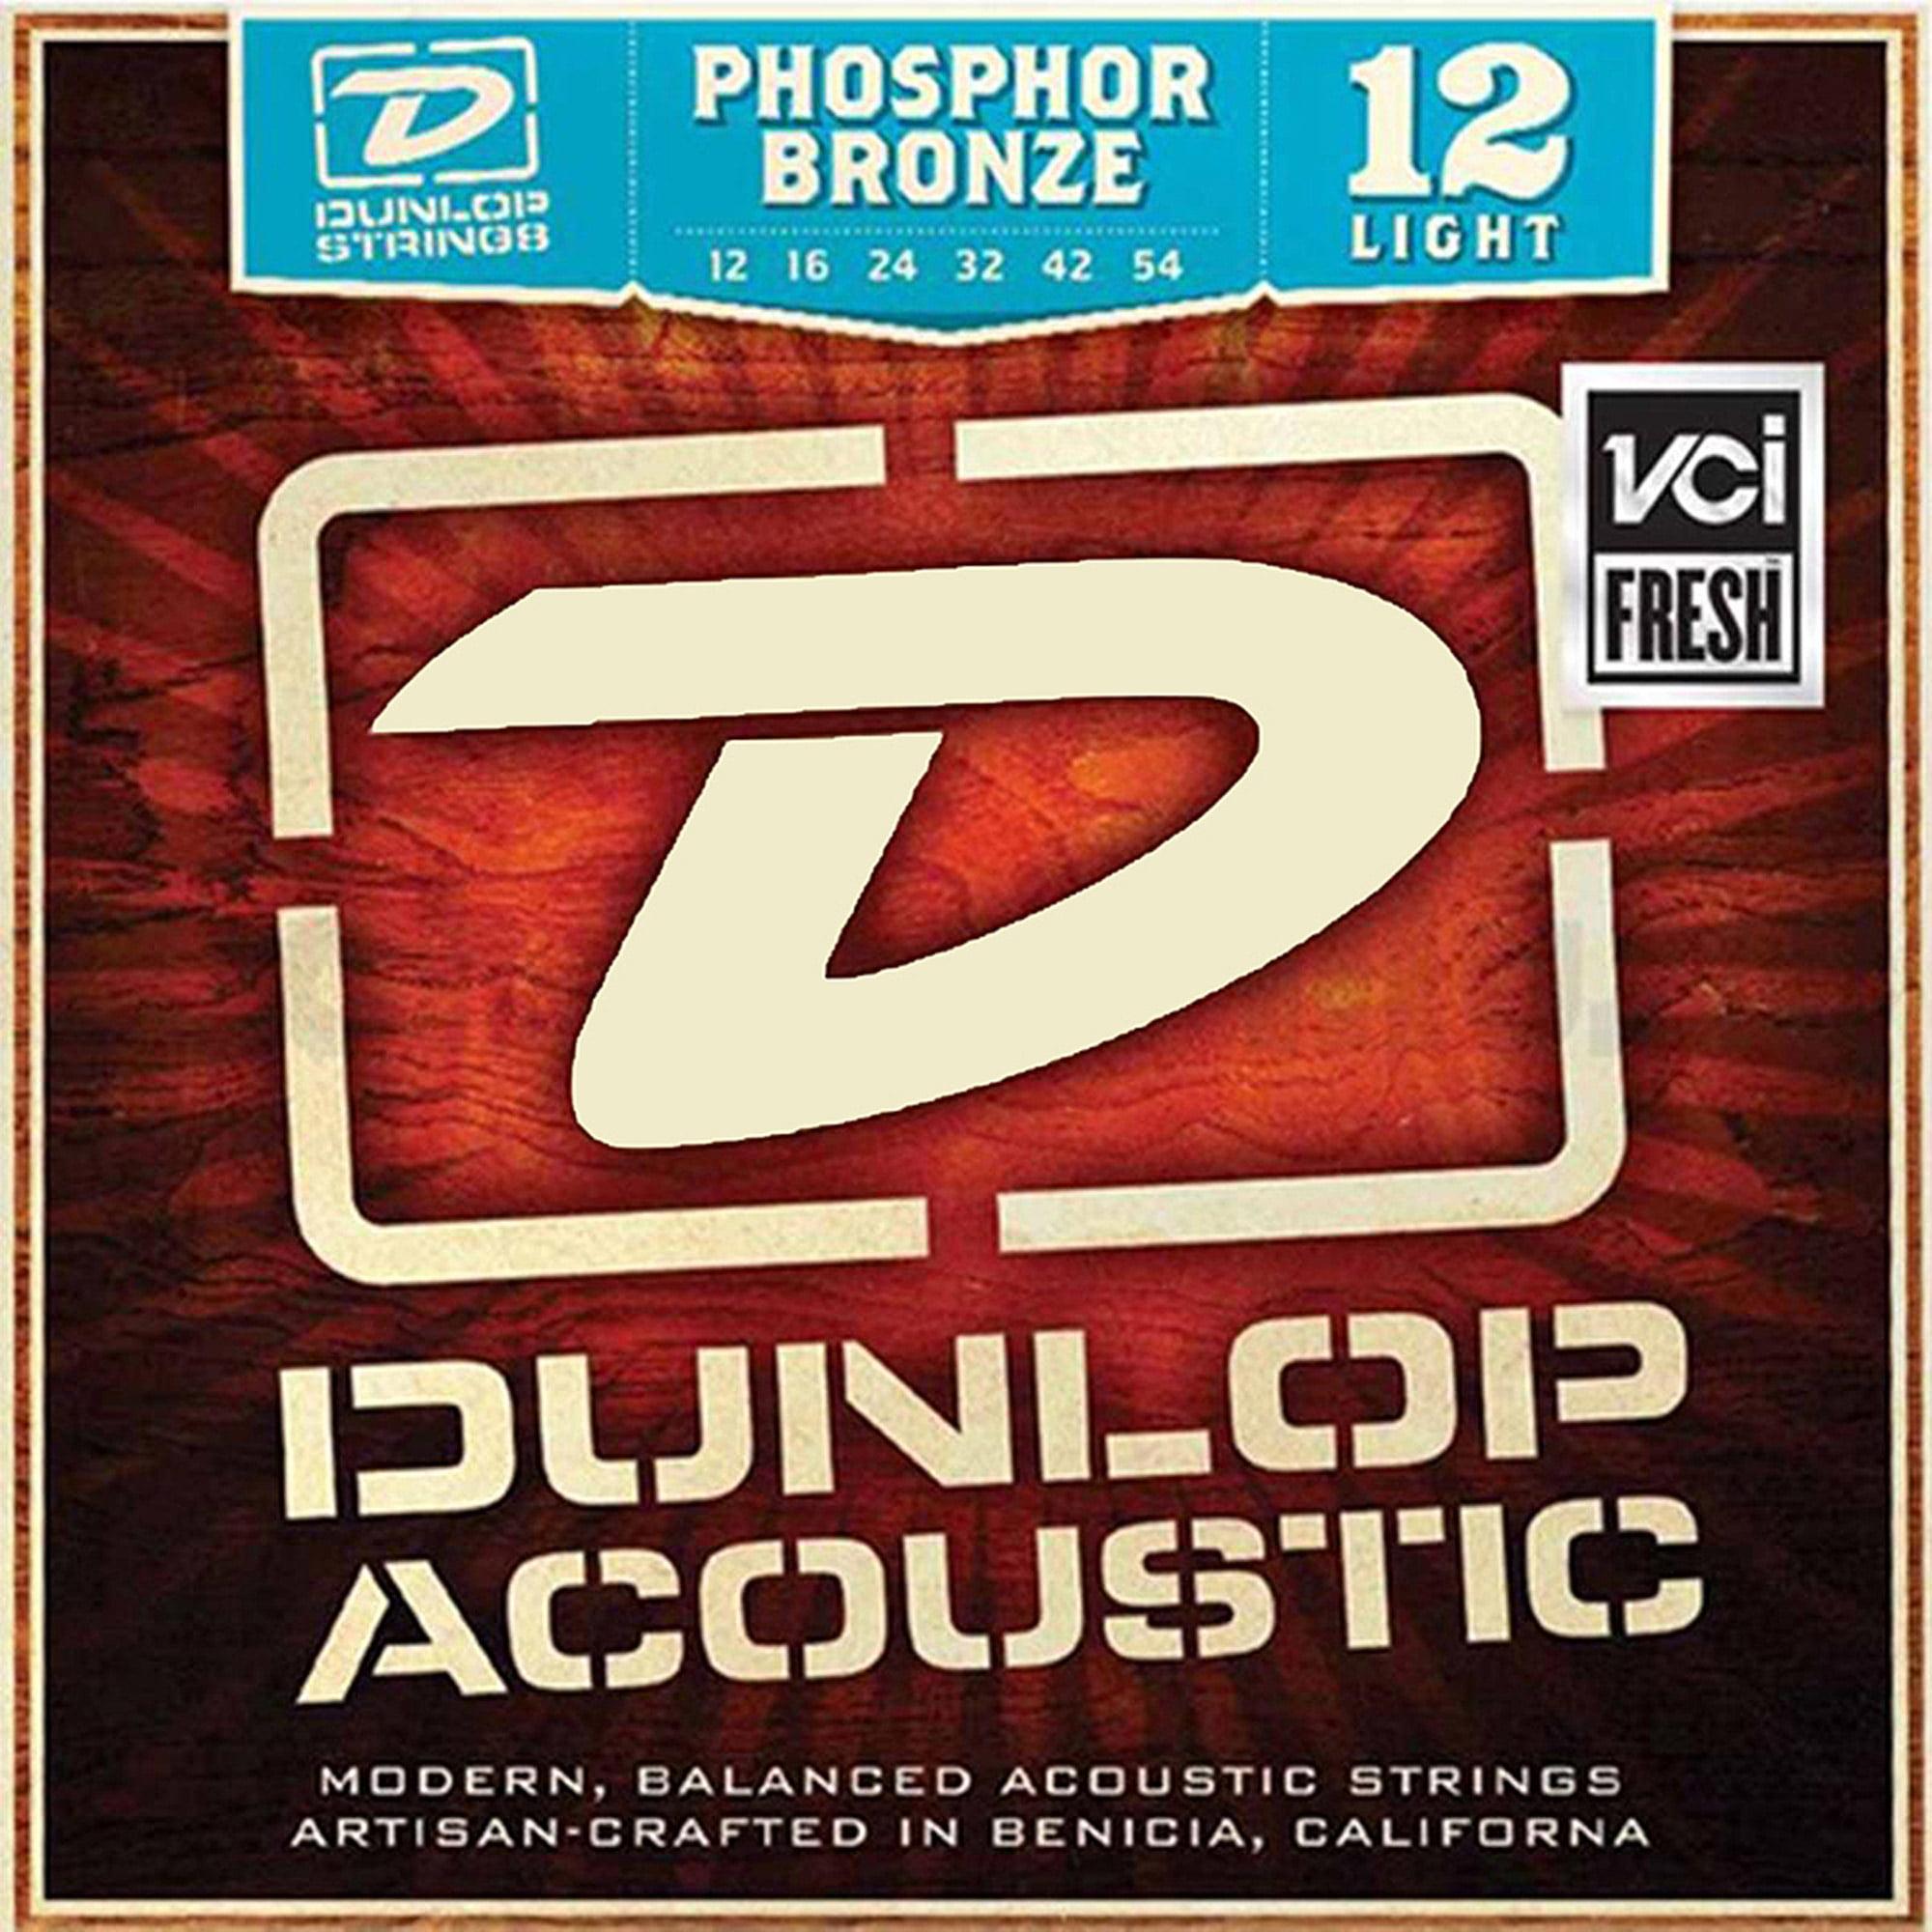 Dunlop DAP1254 Phosphore Bronze Light Acoustic Strings 6-String Set, .012-.054 by Dunlop